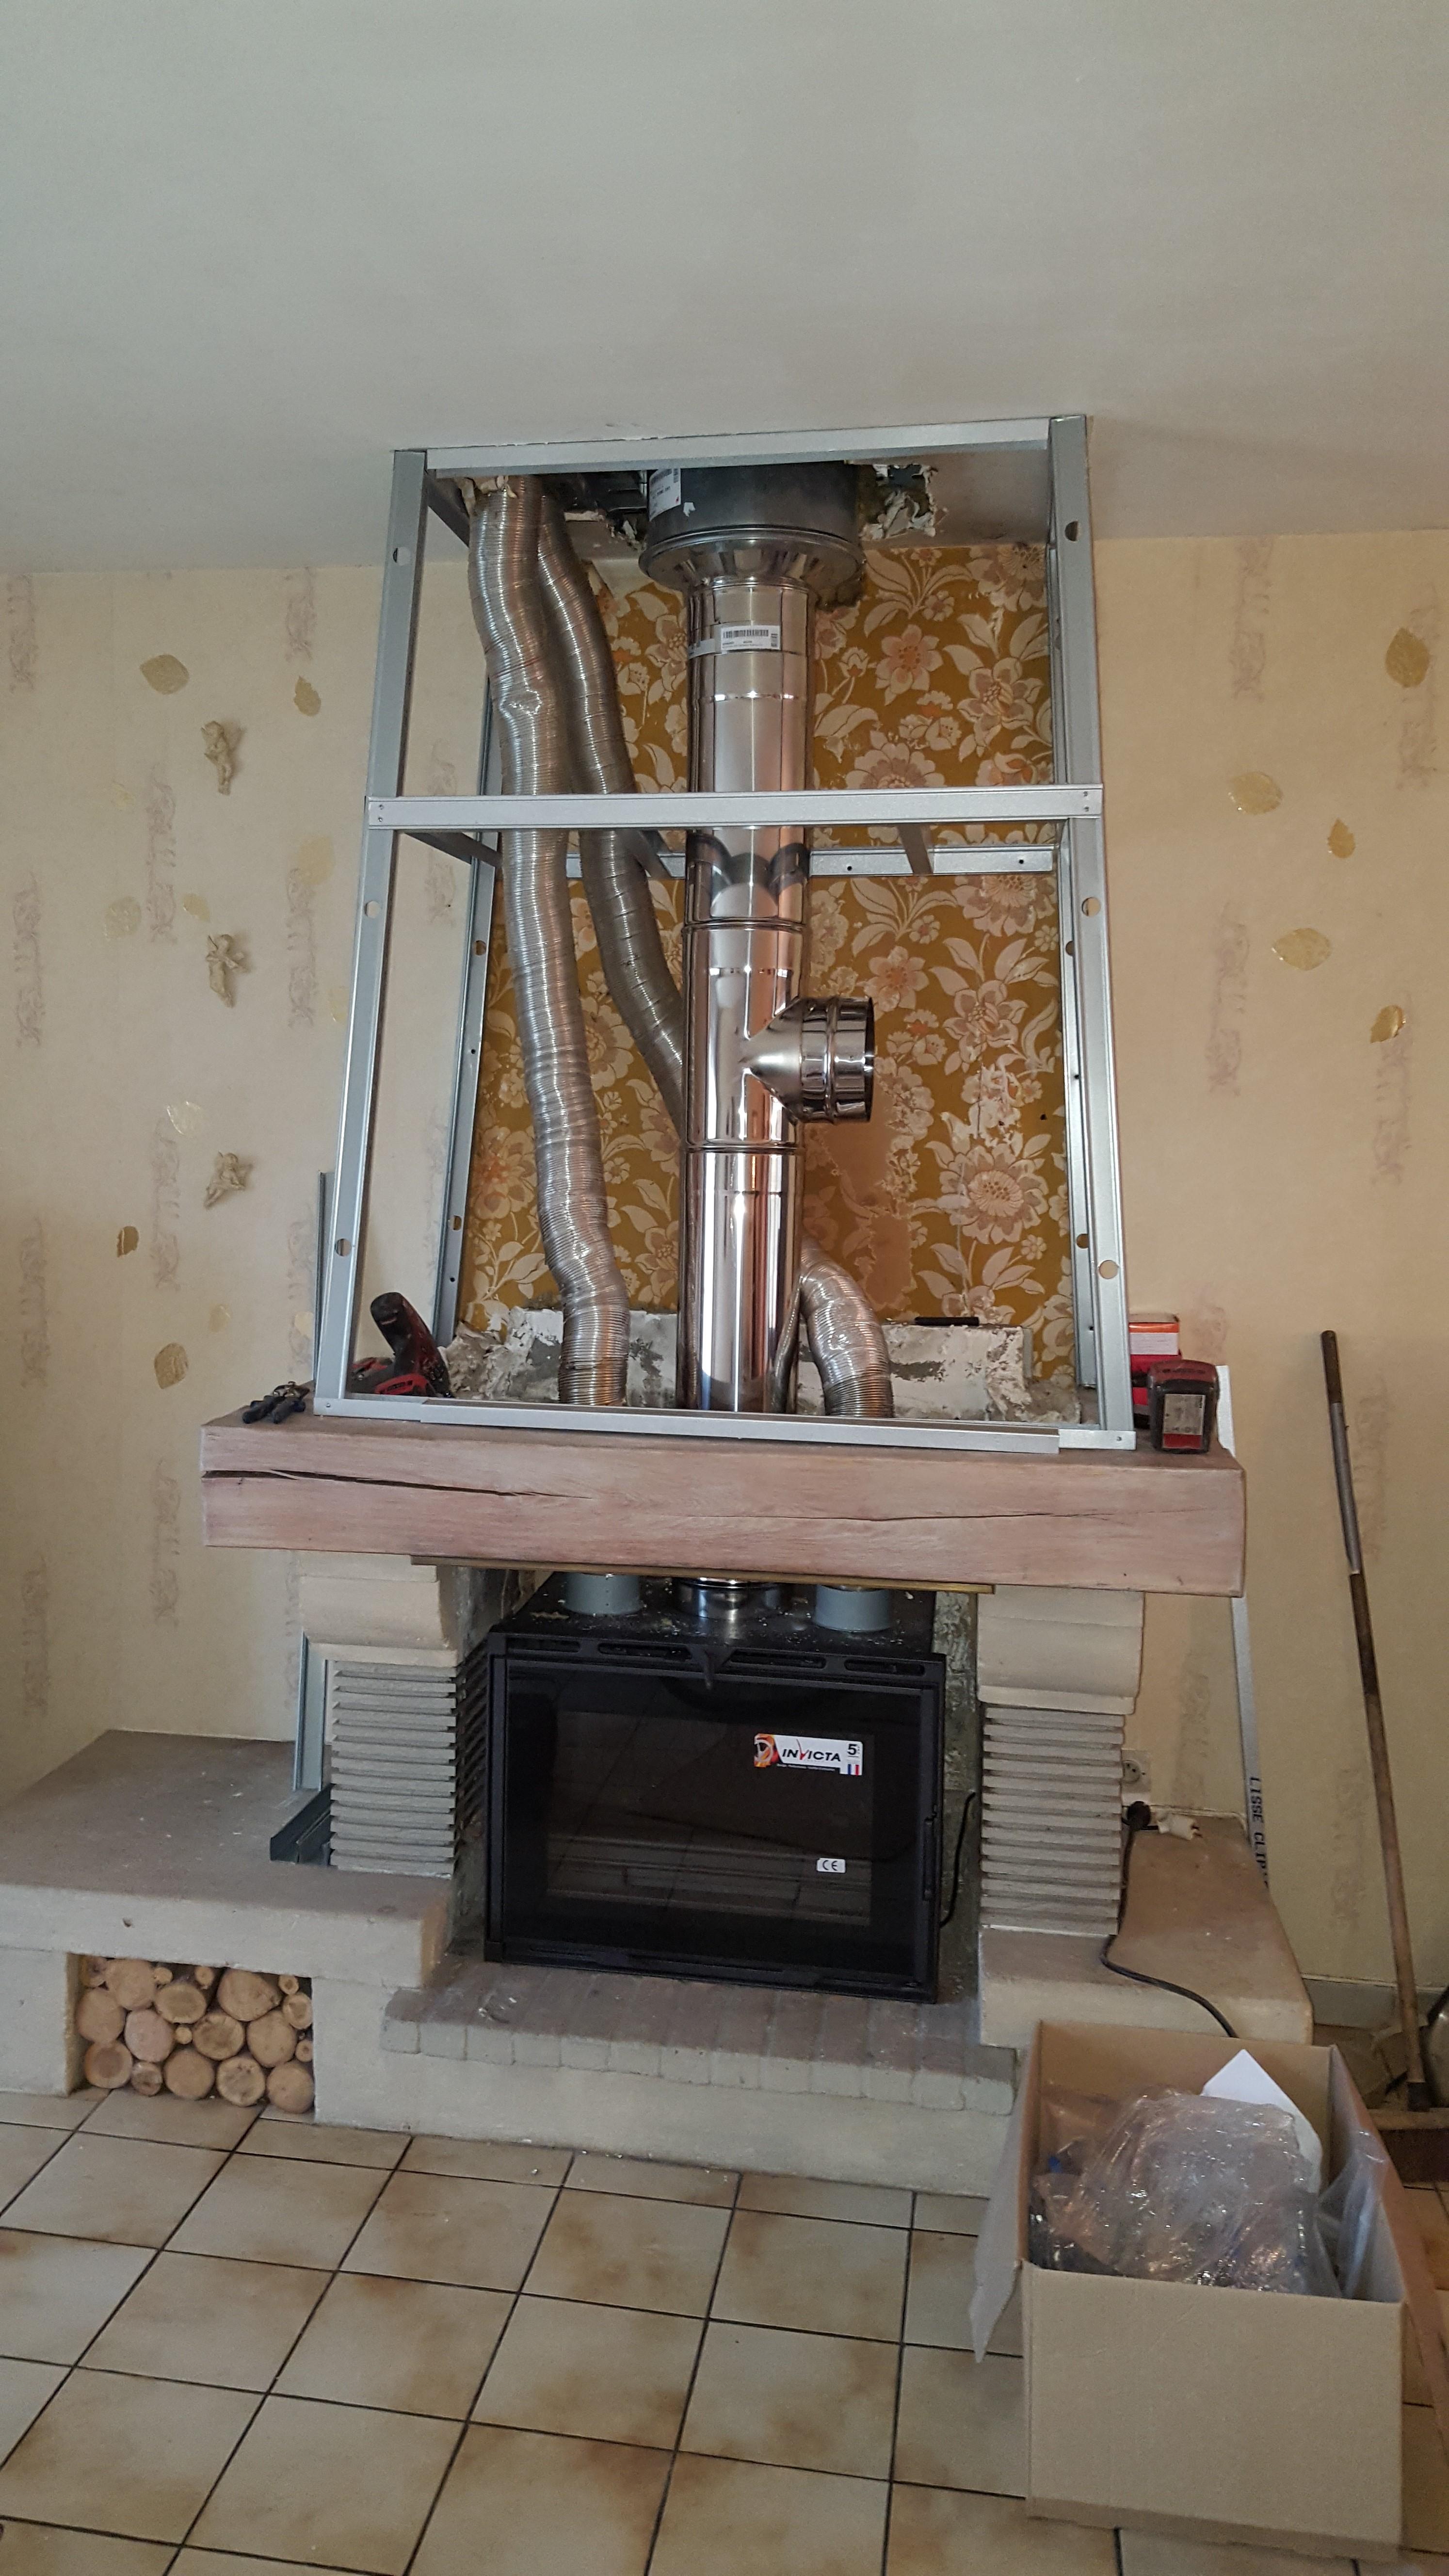 remplacement tubage et insert bcv thermique chauffage plomberie sanitaire ventilation. Black Bedroom Furniture Sets. Home Design Ideas